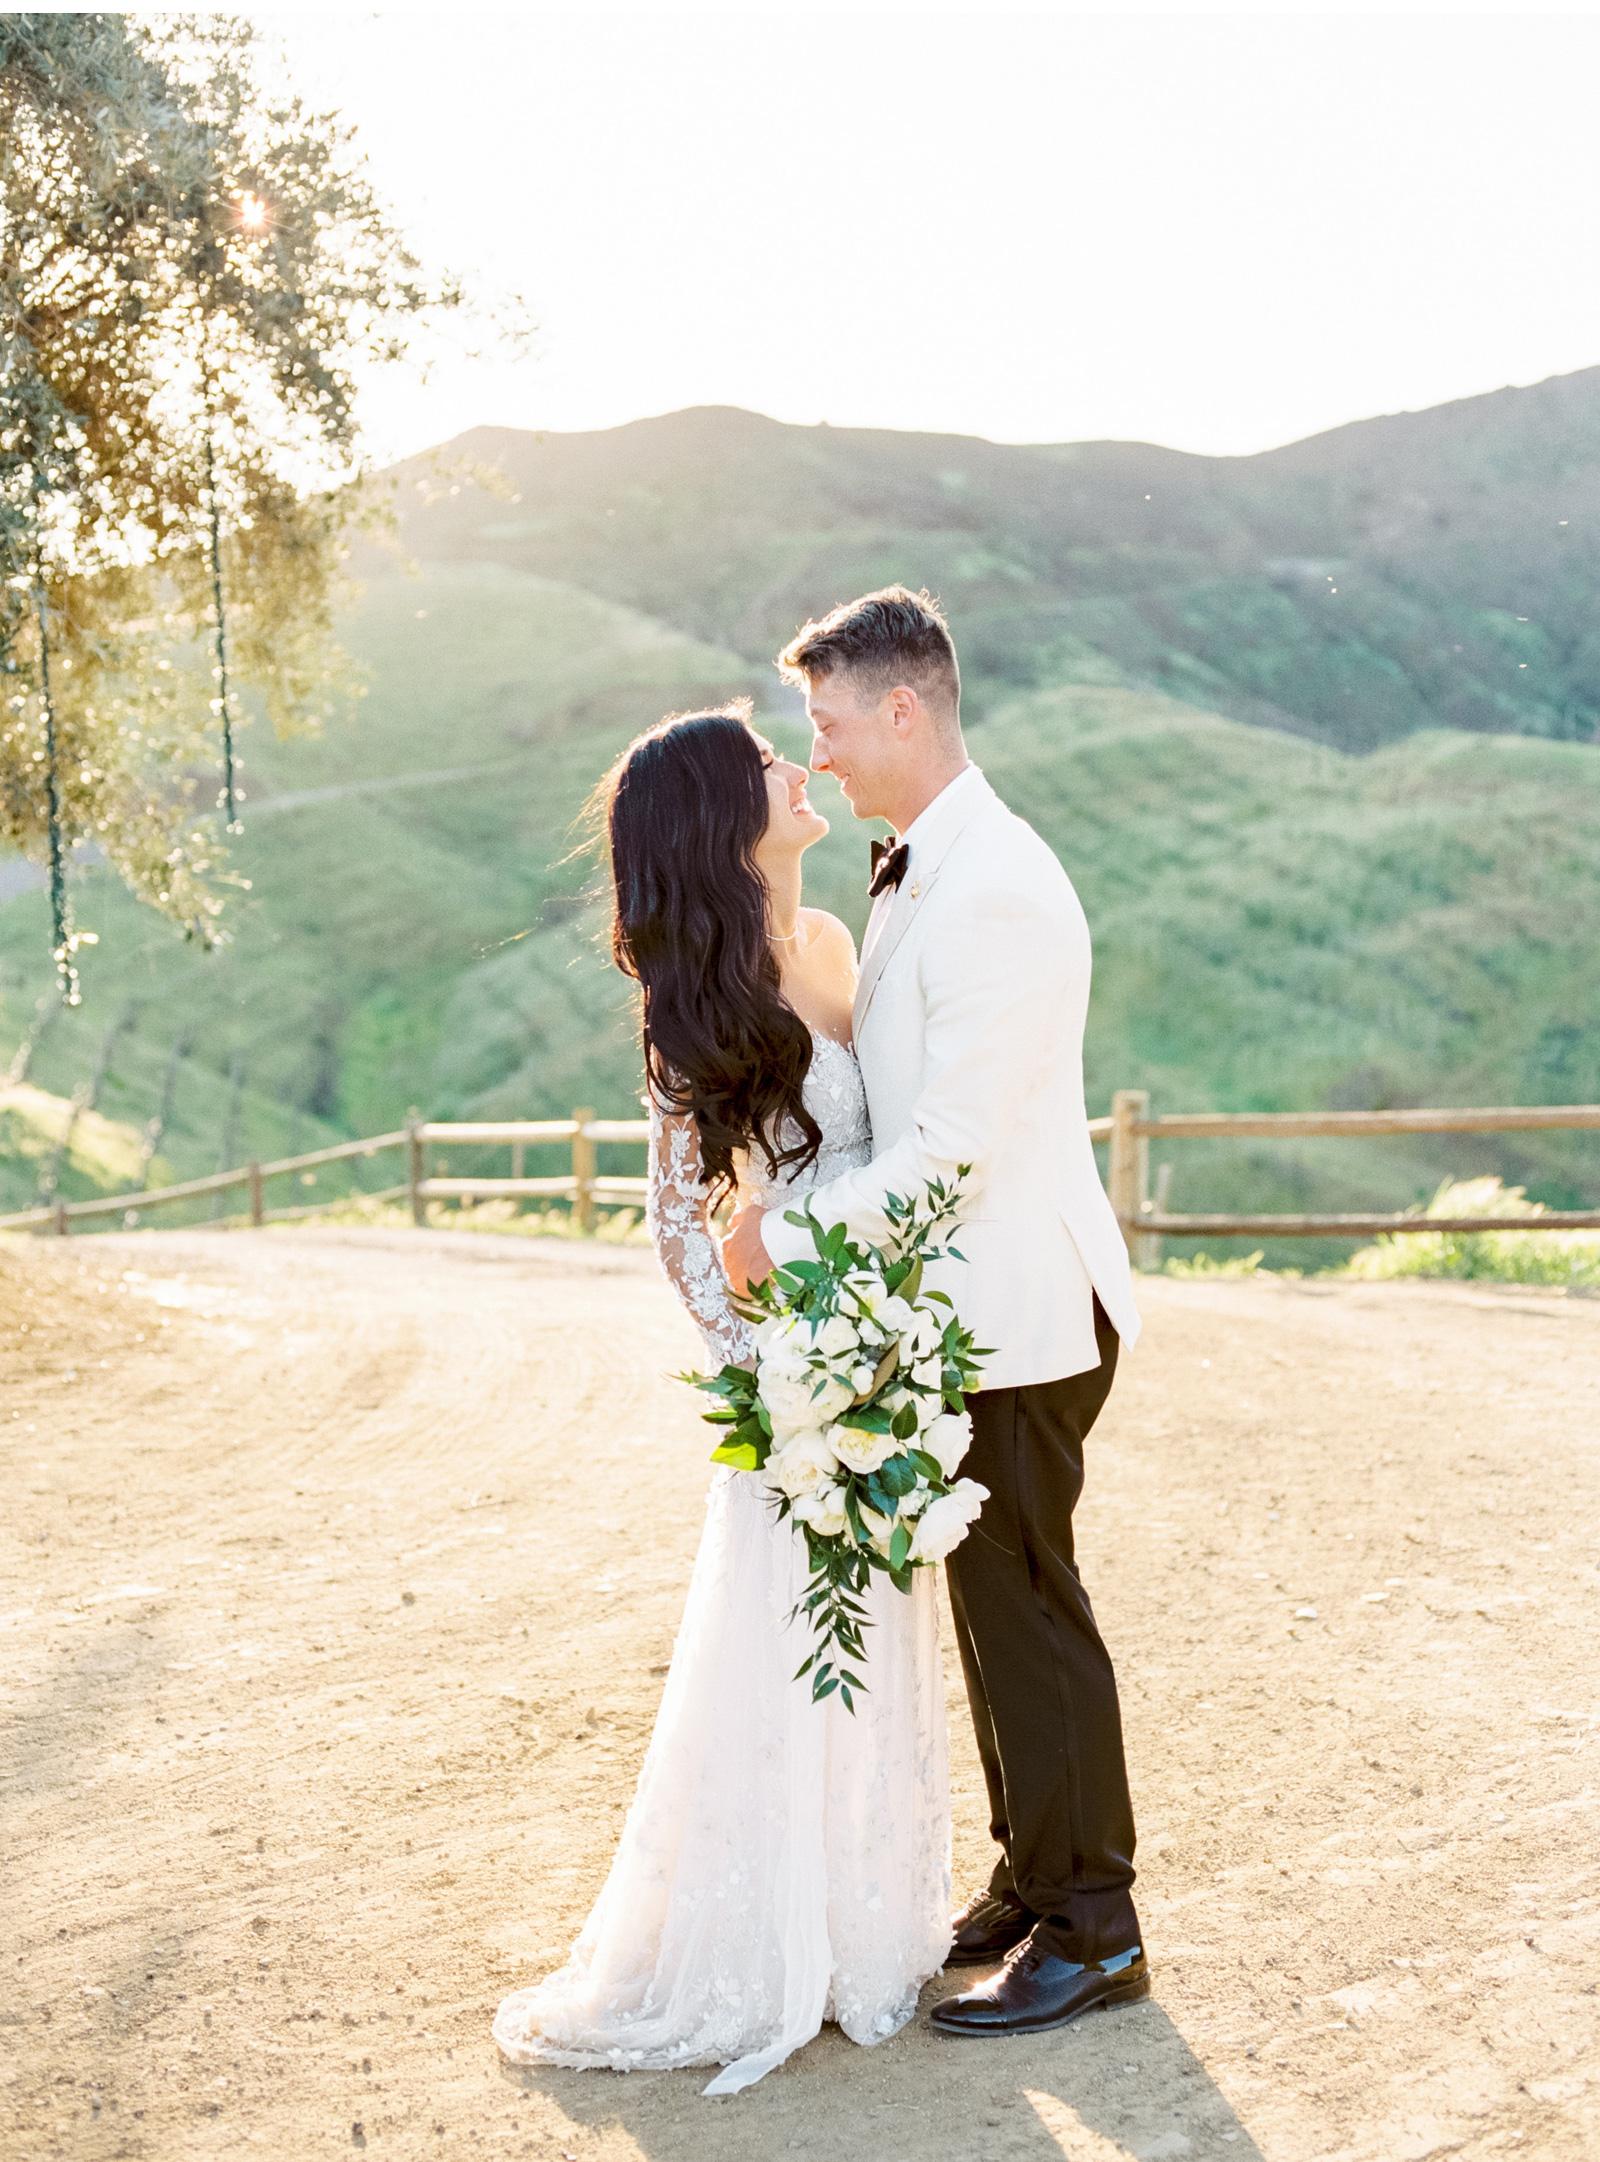 Malibu-Rocky-Oaks-Wedding-Style-Me-Pretty-Southern-California-Wedding-Venues-Fine-Art-Wedding-Photogrpaher-Natalie-Schutt-Photography_10.jpg